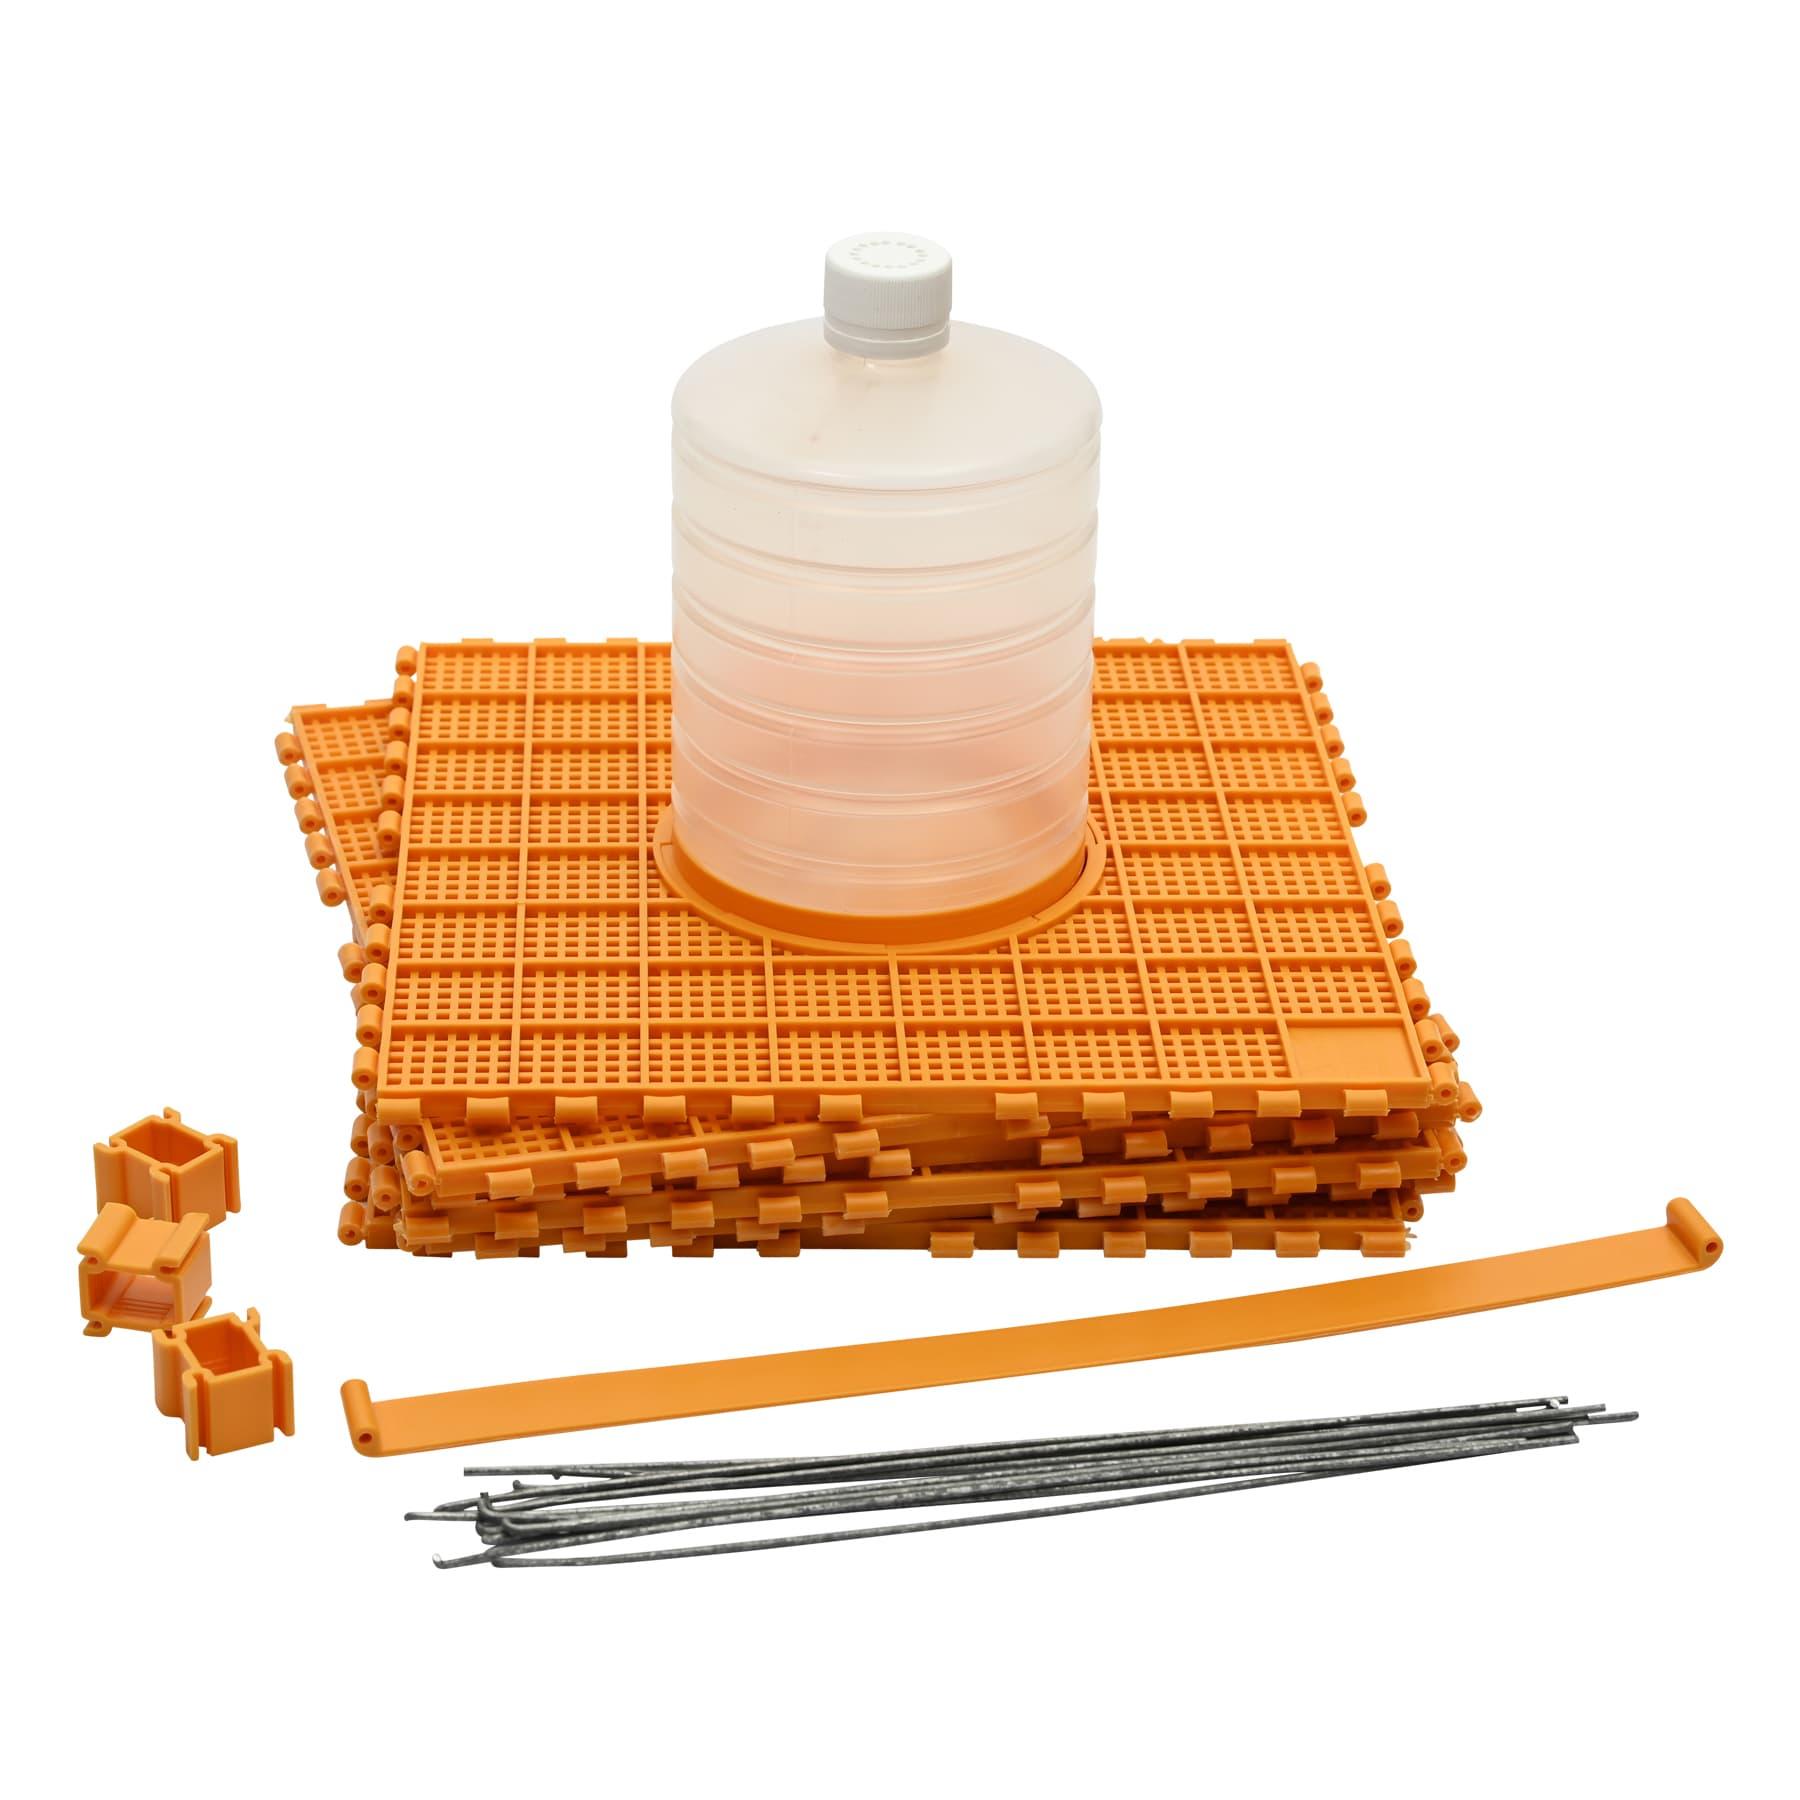 Multibox zum Transport oder zur Faulbrutsanierung